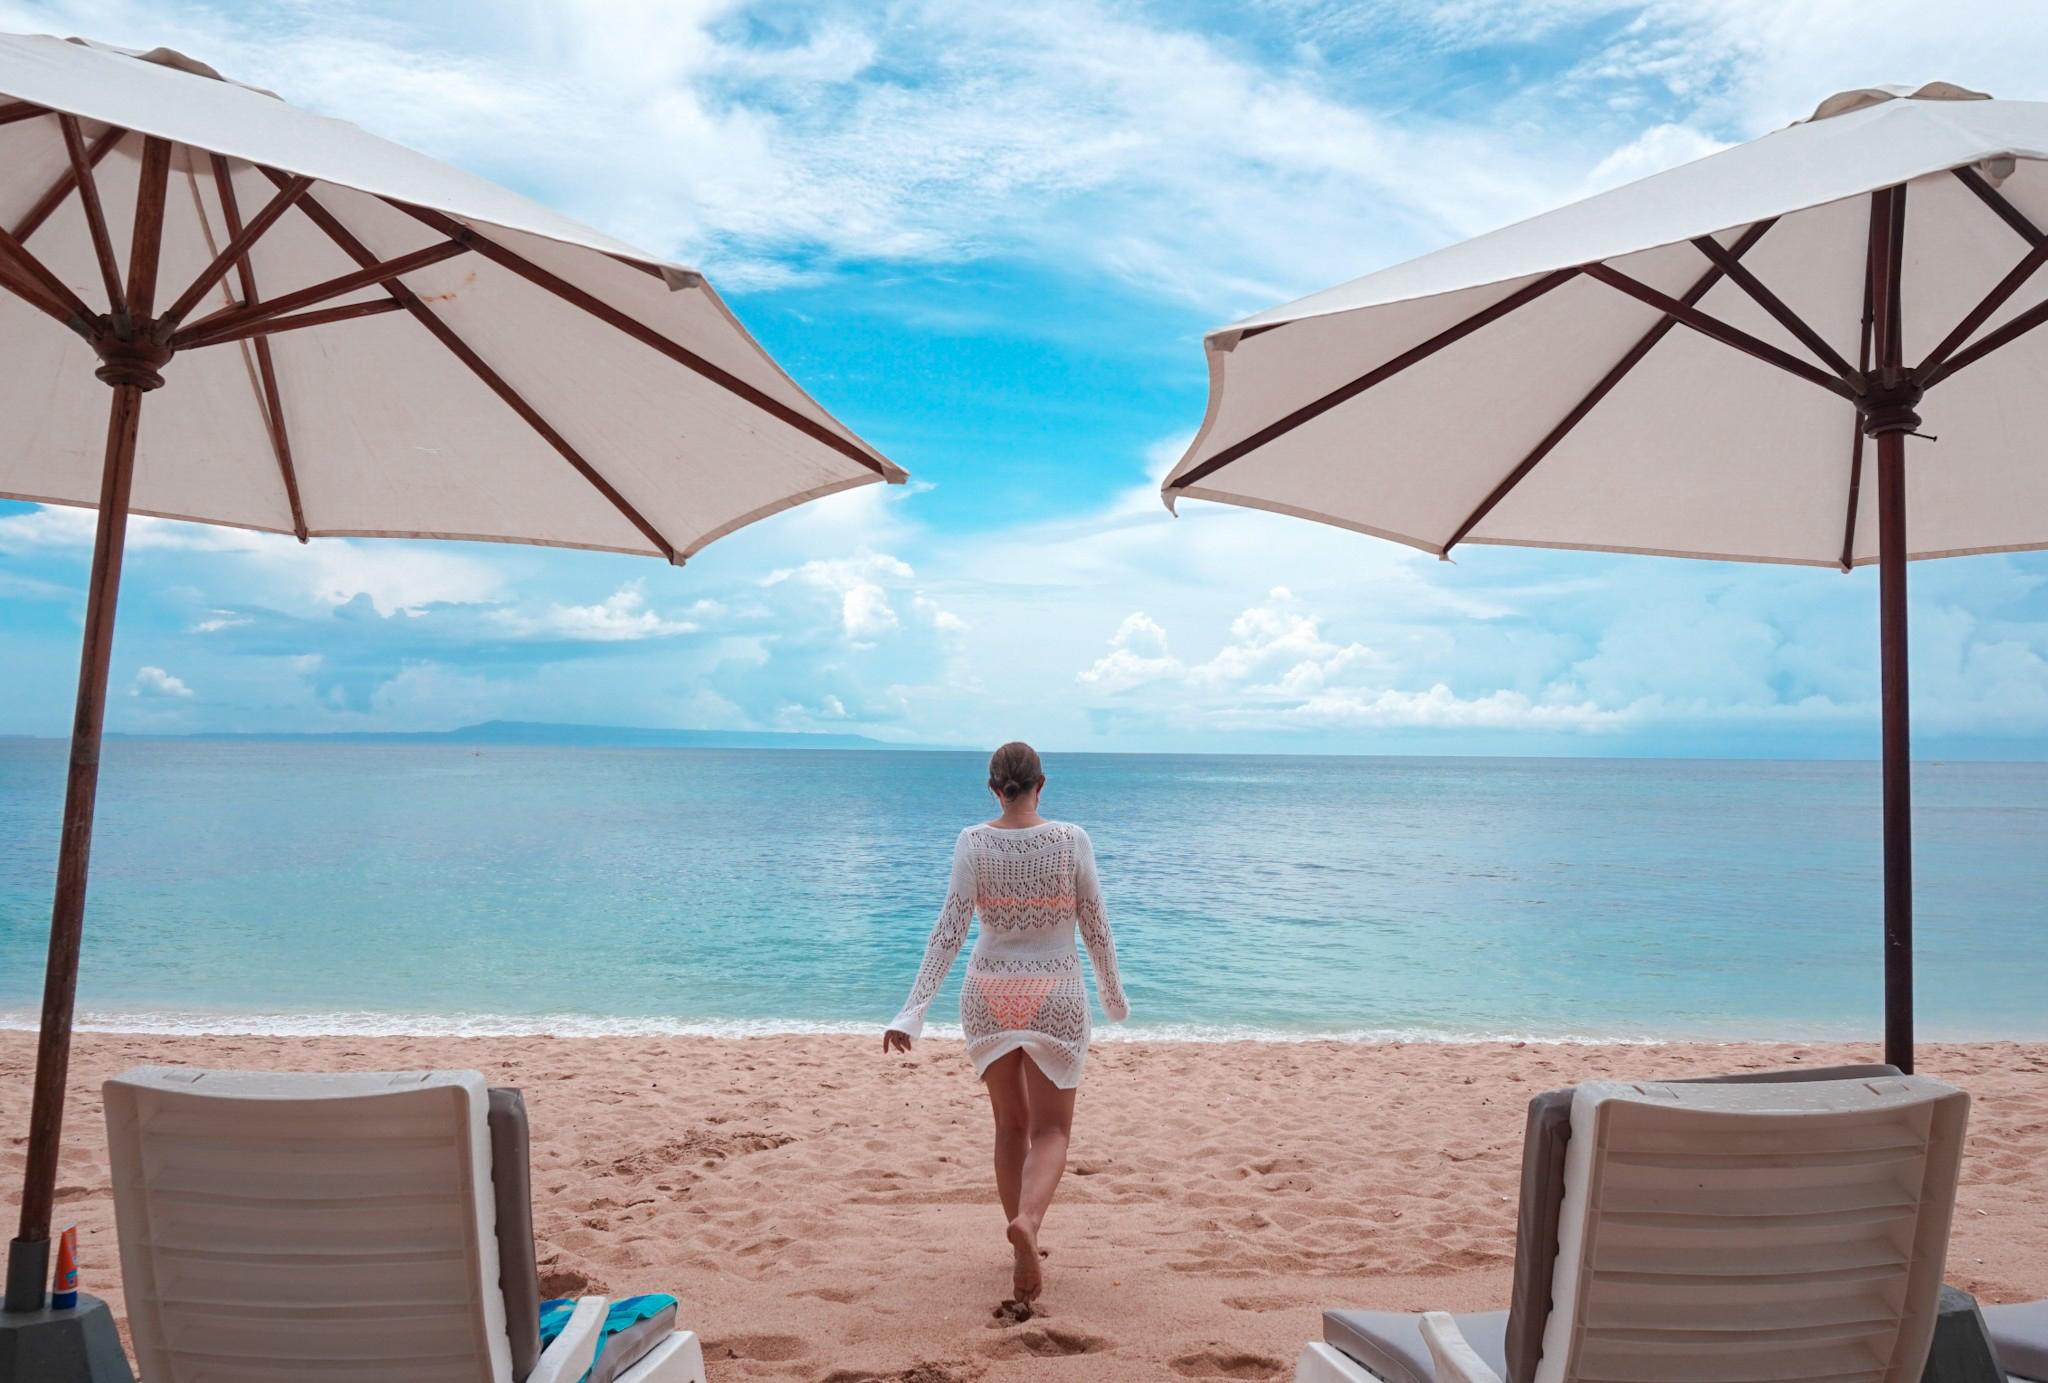 Hilton-Bali-resort-2018.jpeg